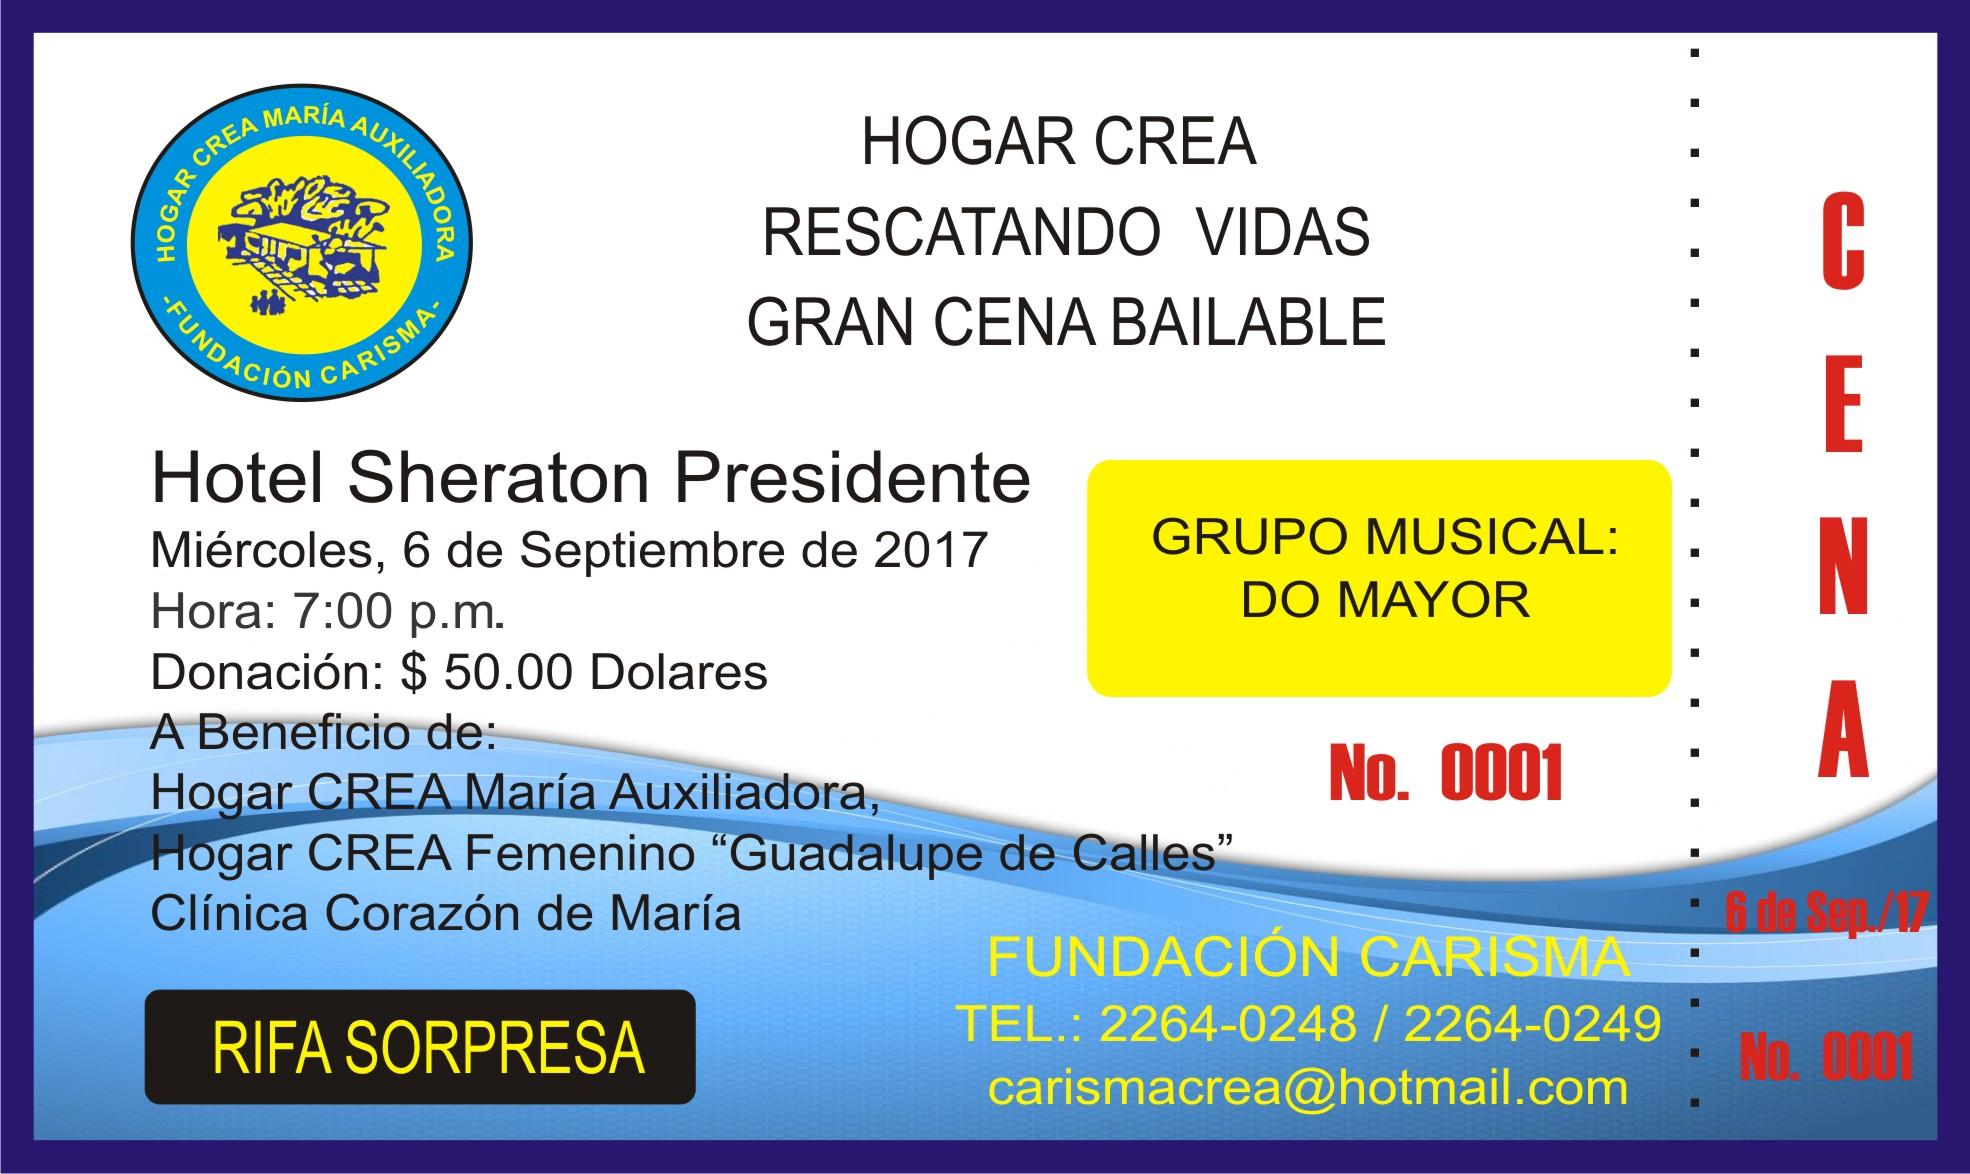 TARJETA-DE-GALA-HOGAR-CREA06-06-1